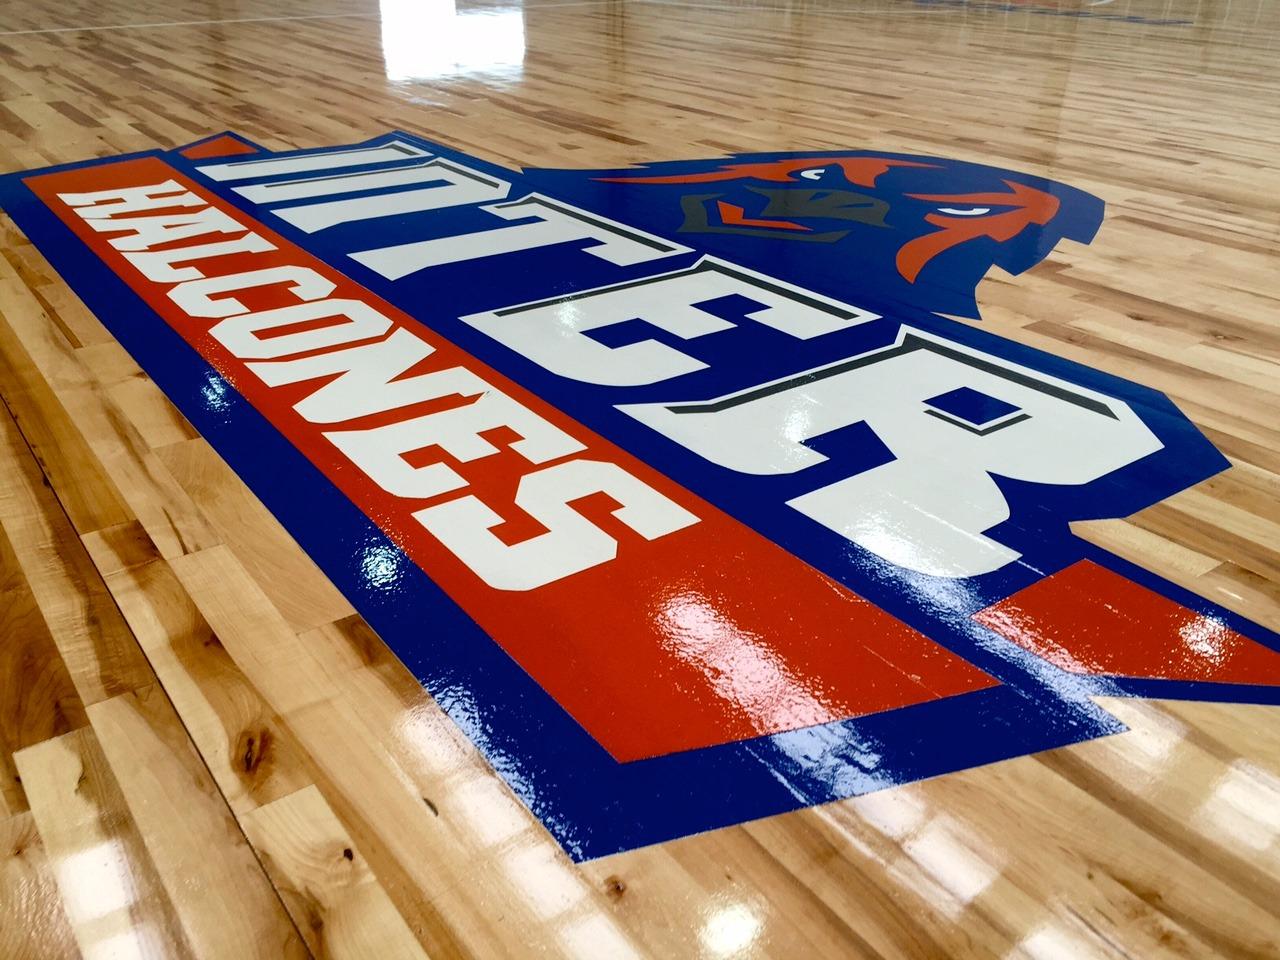 Fotos de cancha de basquetbol, logos de cancha